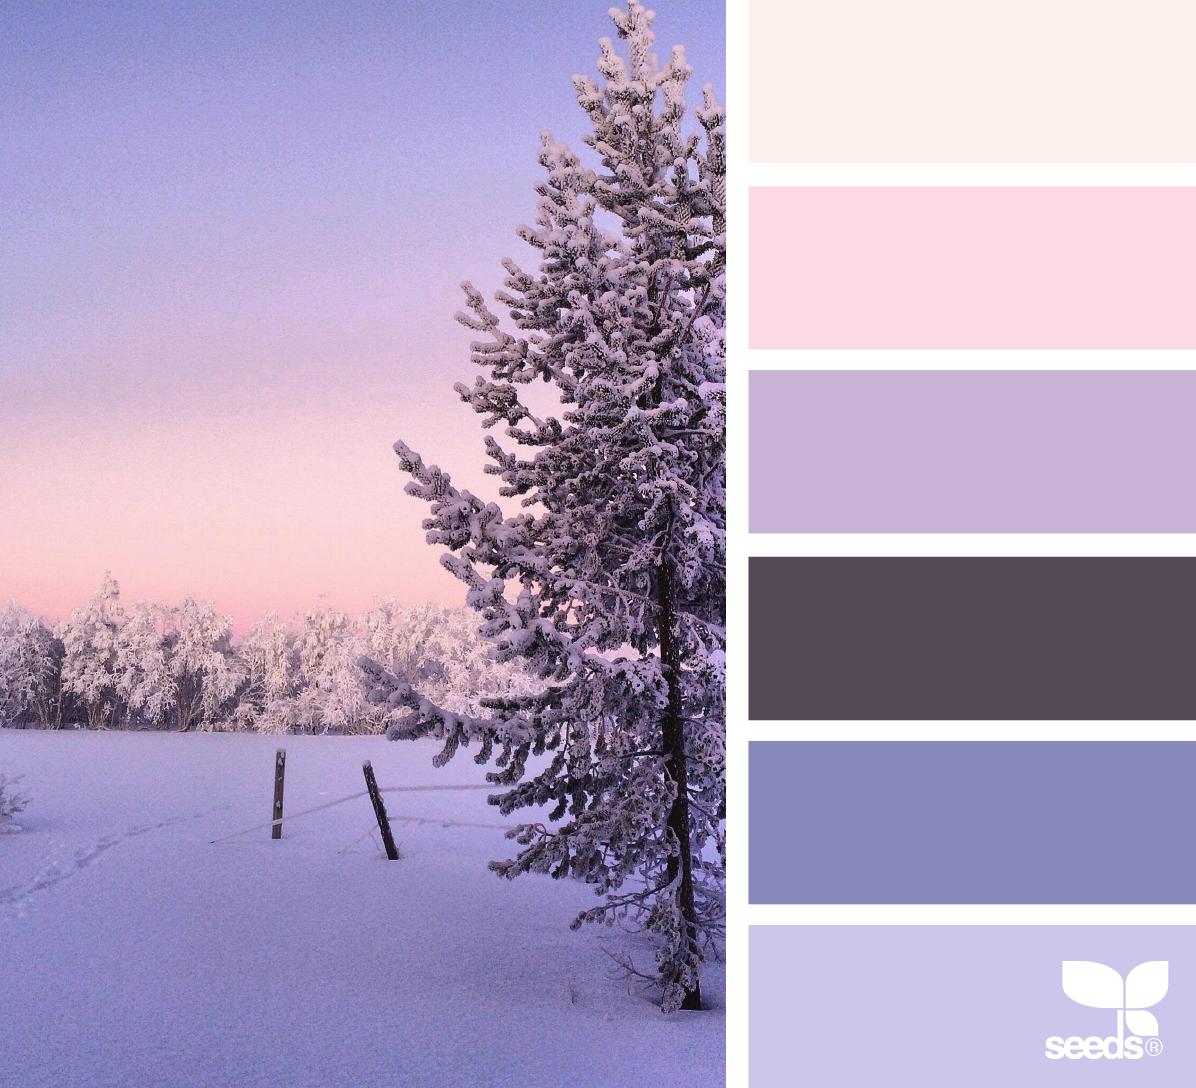 { winter wishes } image via: @arctic_stories